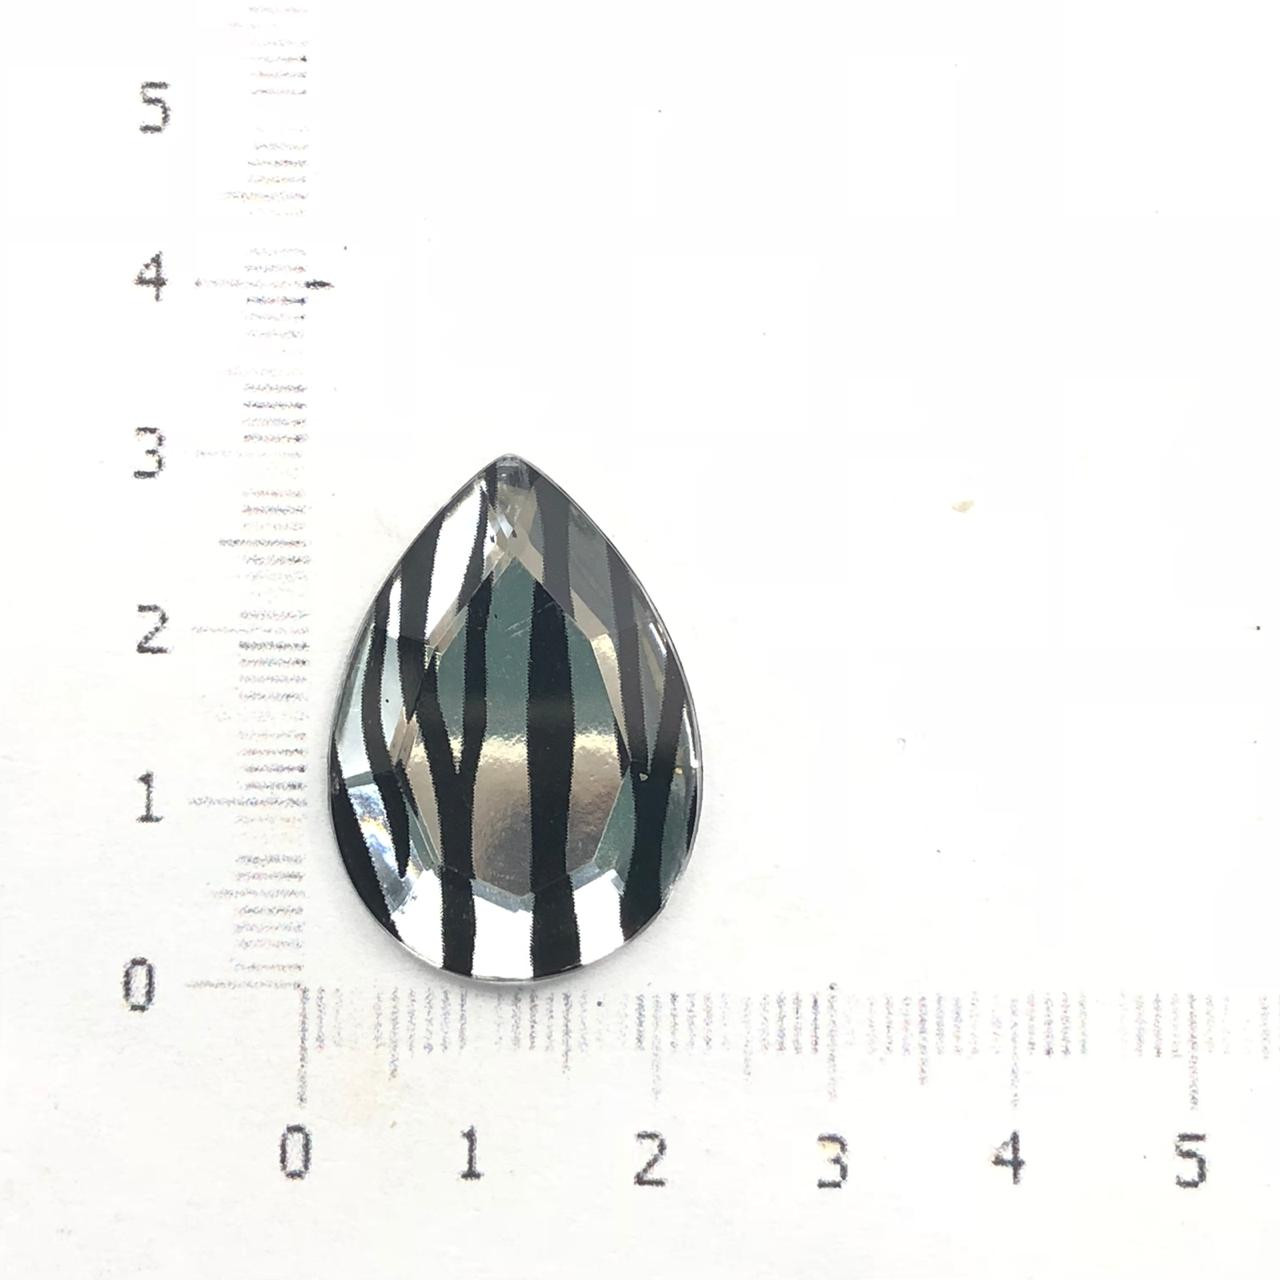 CHT1032 - Chaton Gota 18x25 Cristal Listrado - 4unids